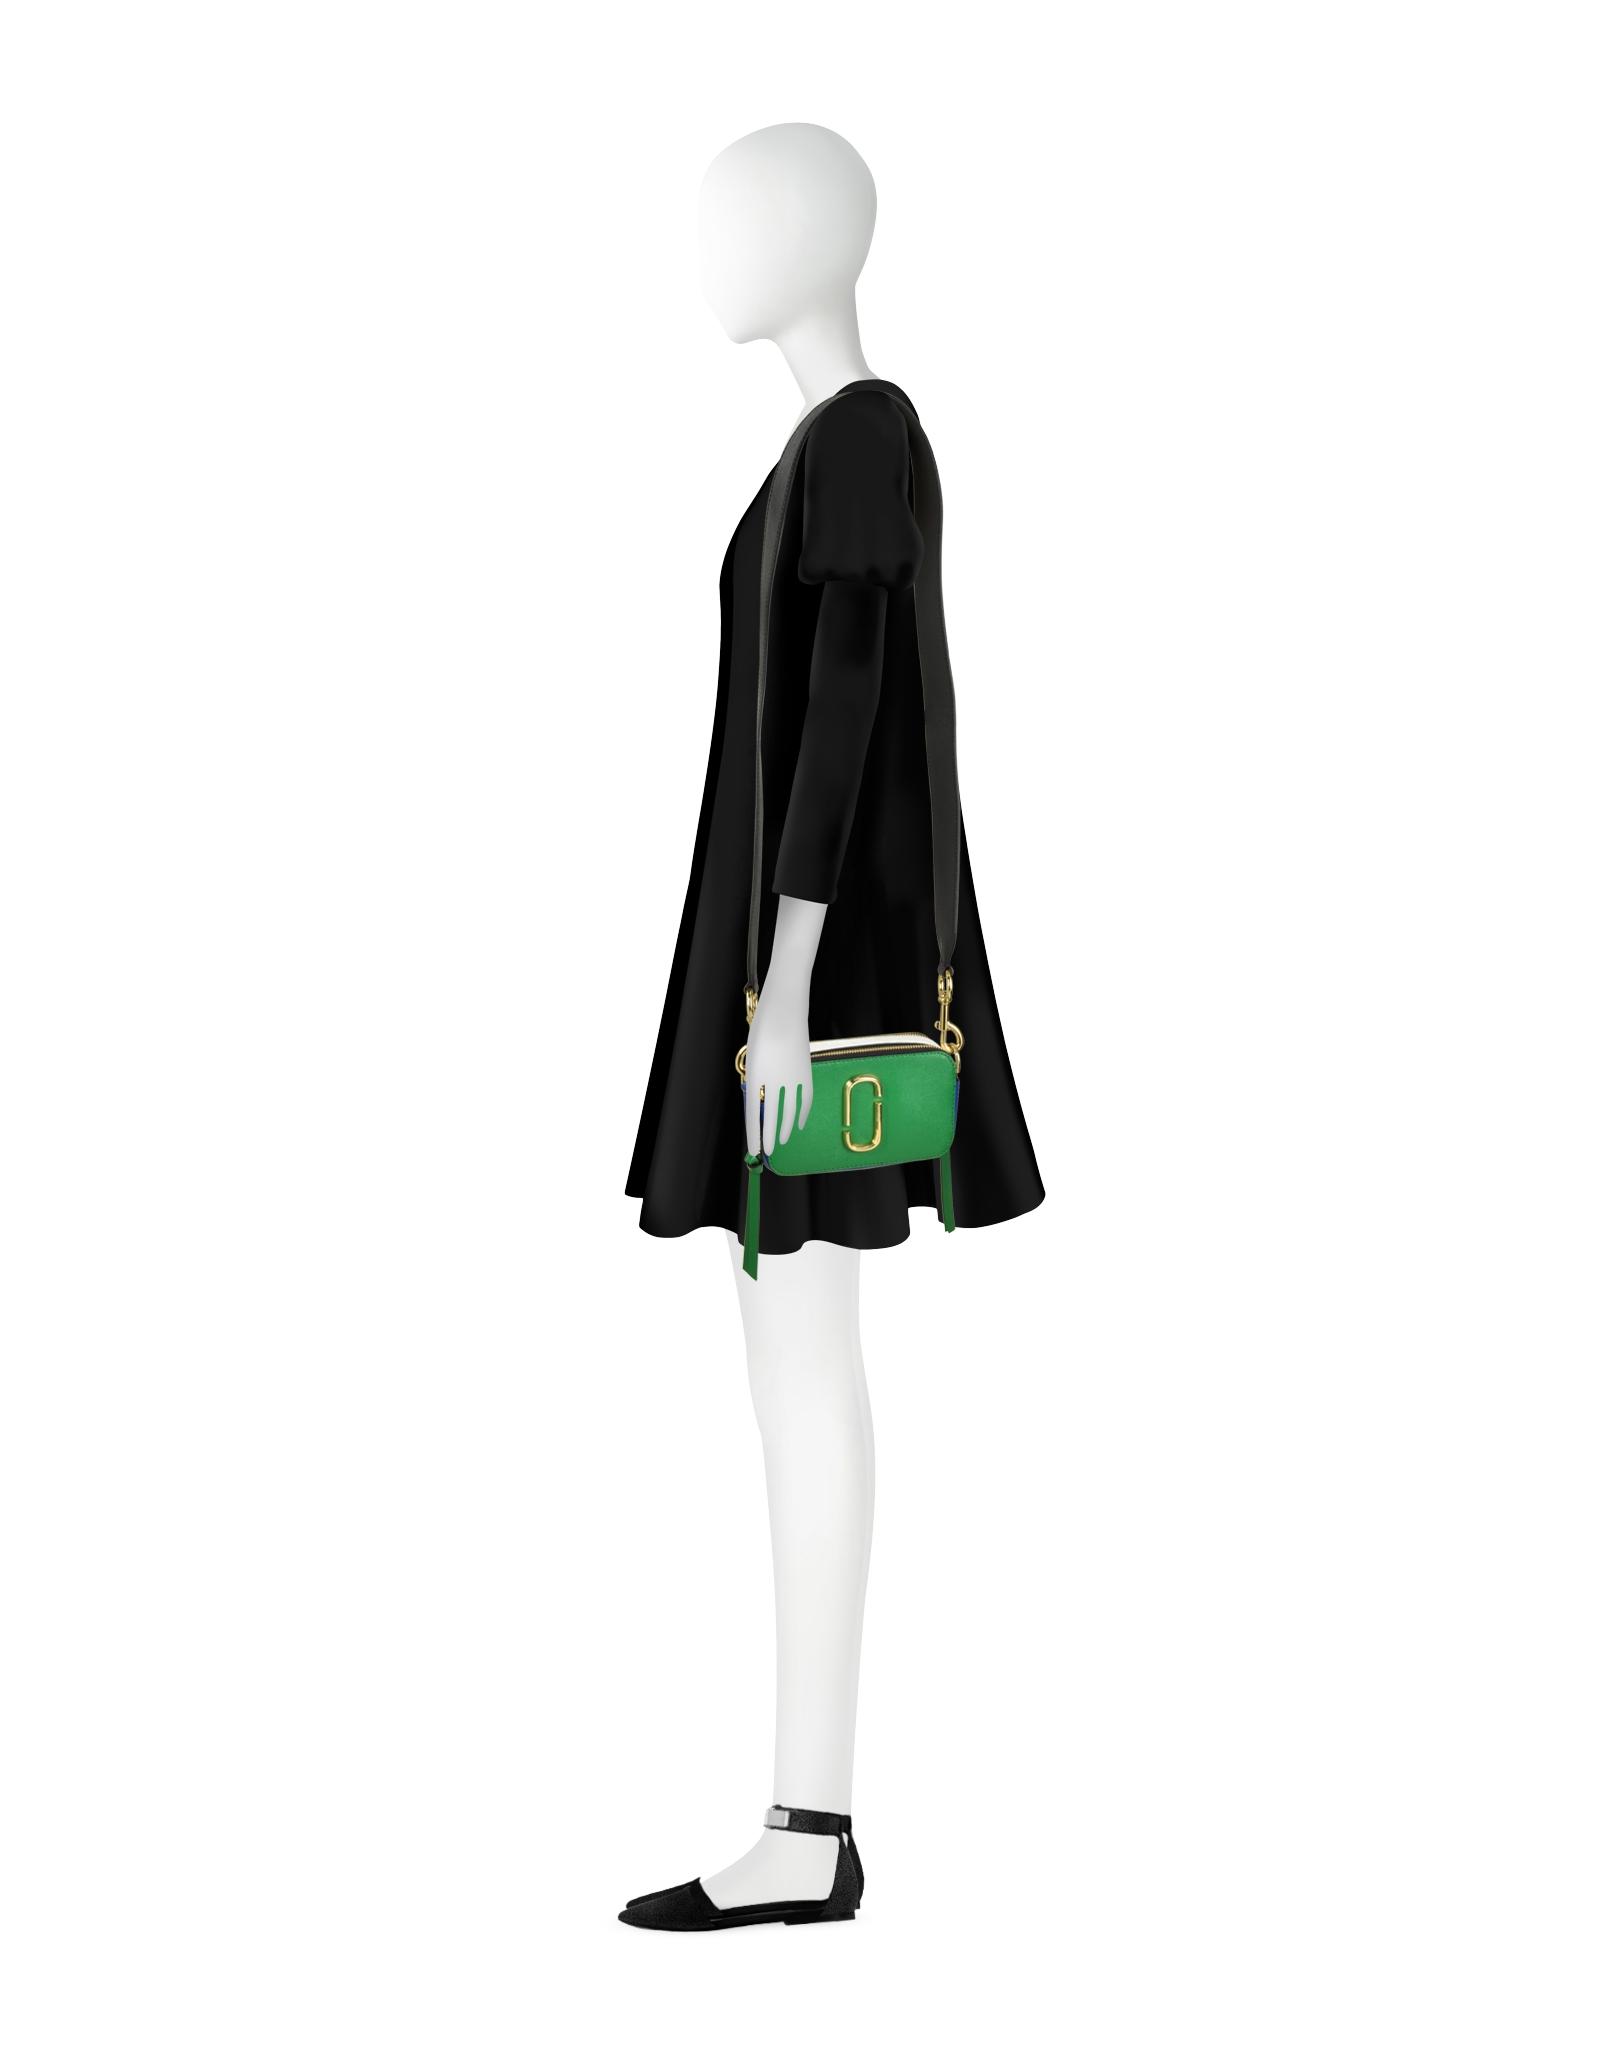 15a9437e3eb0 Marc Jacobs Snapshot Green Grass Saffiano Leather Small Camera Bag ...